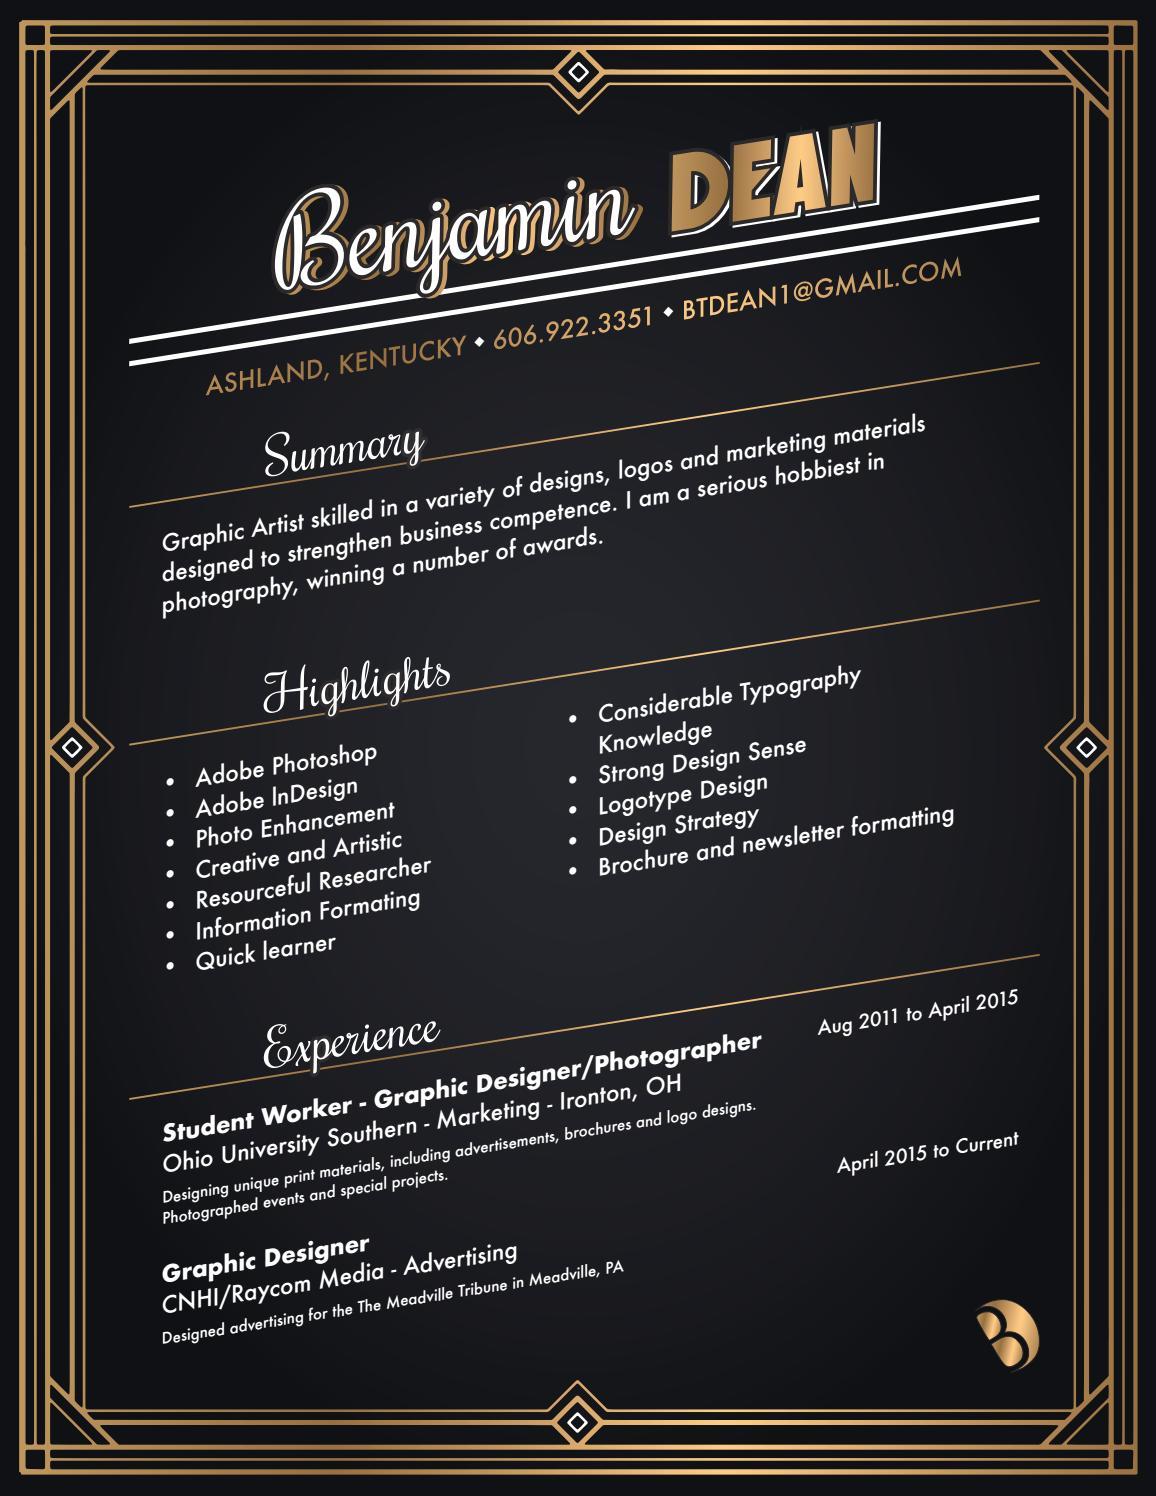 Benjamin's Graphic Resume by btdean1 - issuu